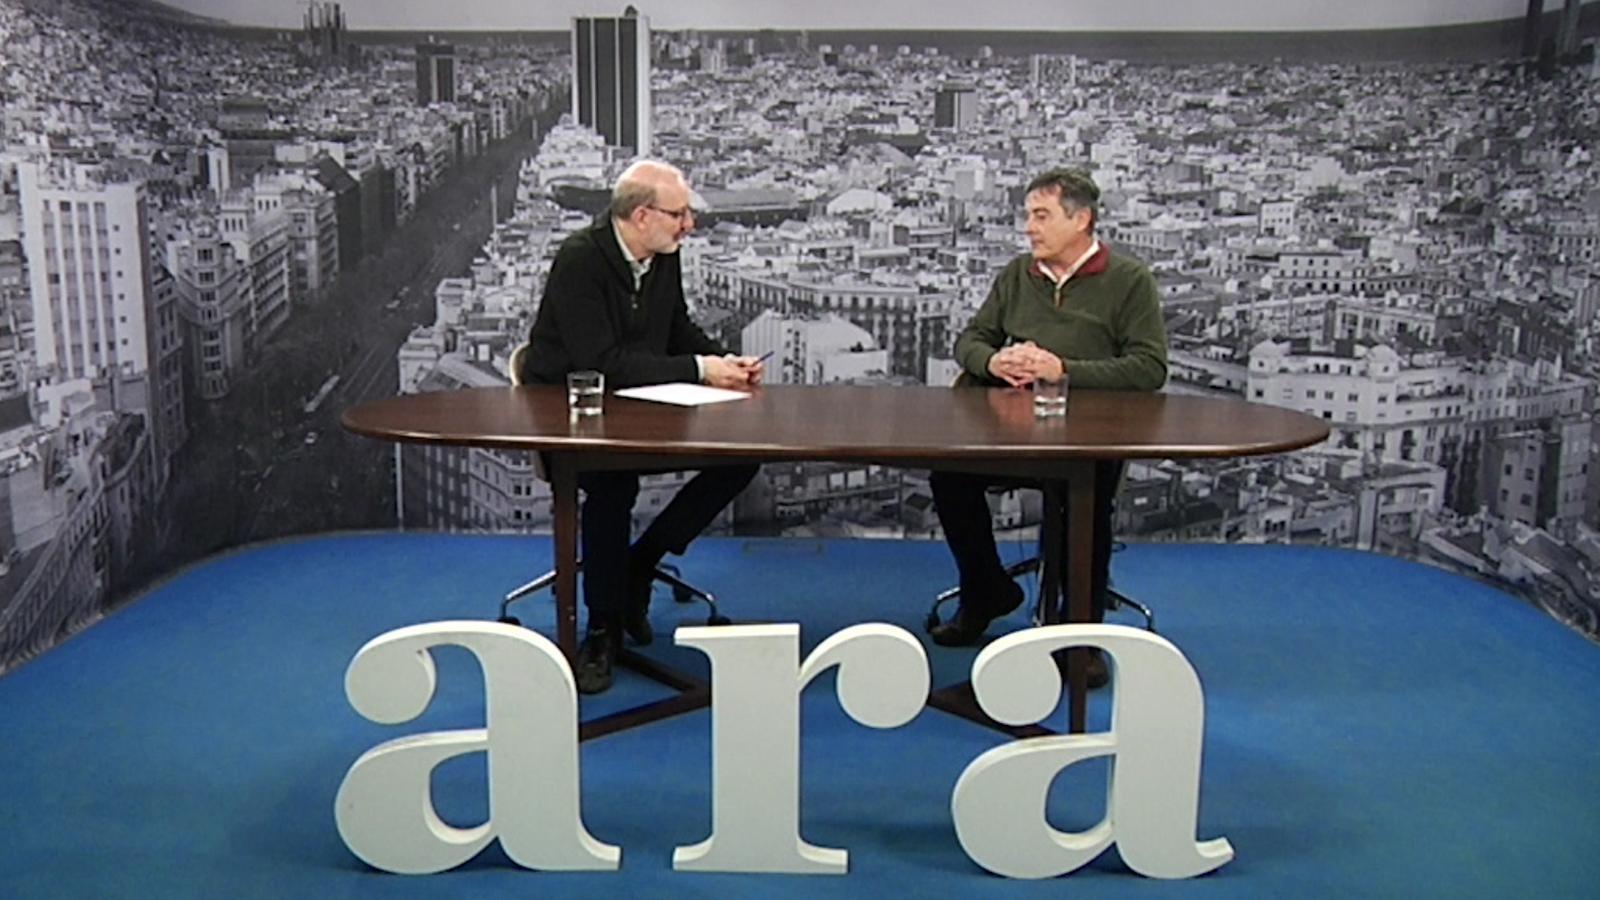 Entrevista d'Antoni Bassas a Enric Canet